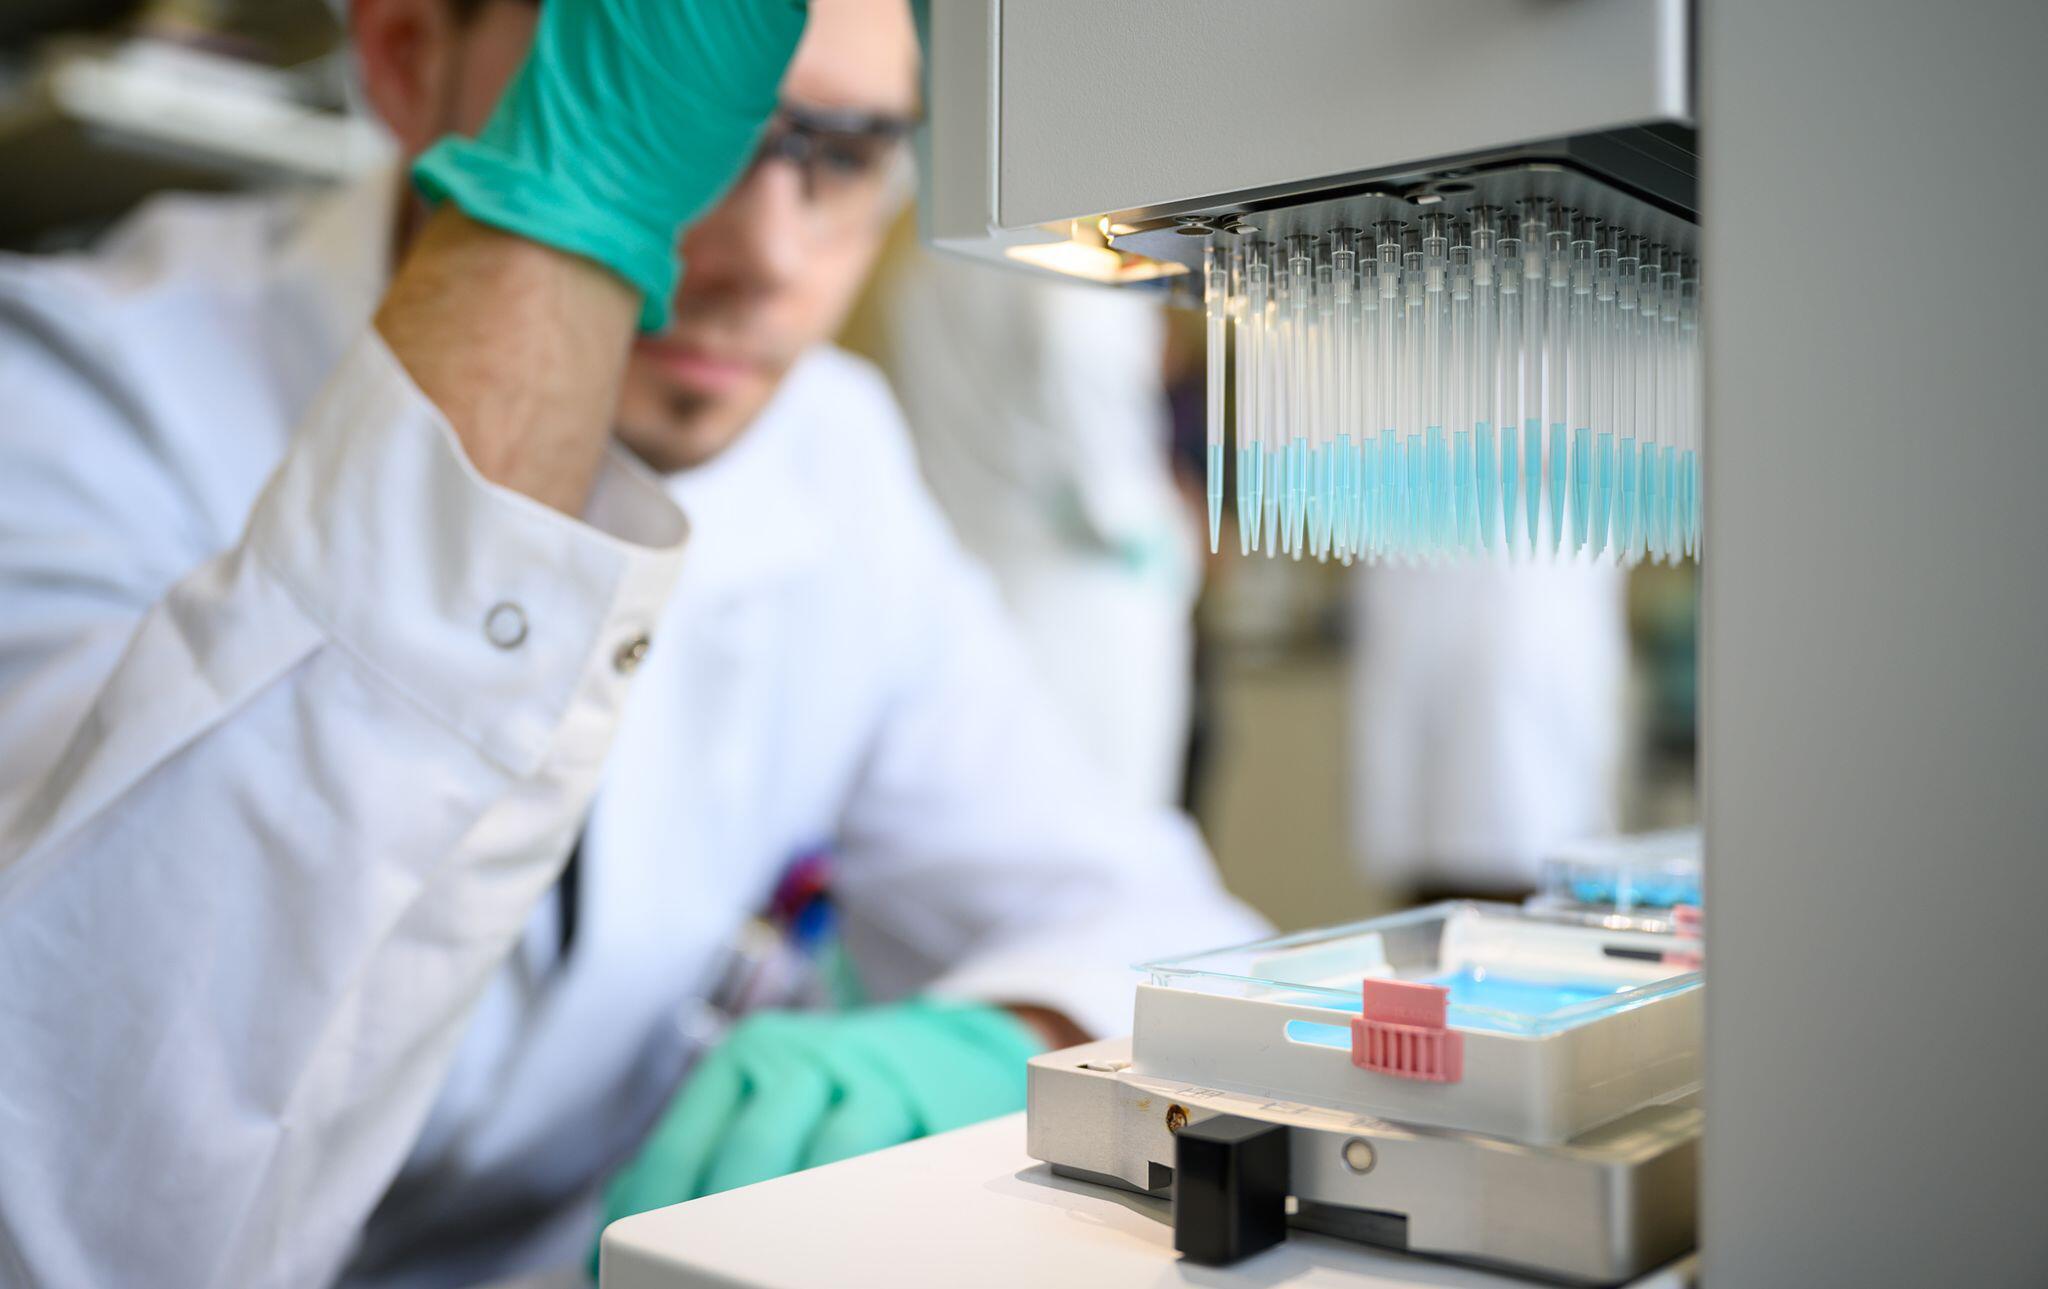 Bild zu Biotech-Unternehmen Curevac